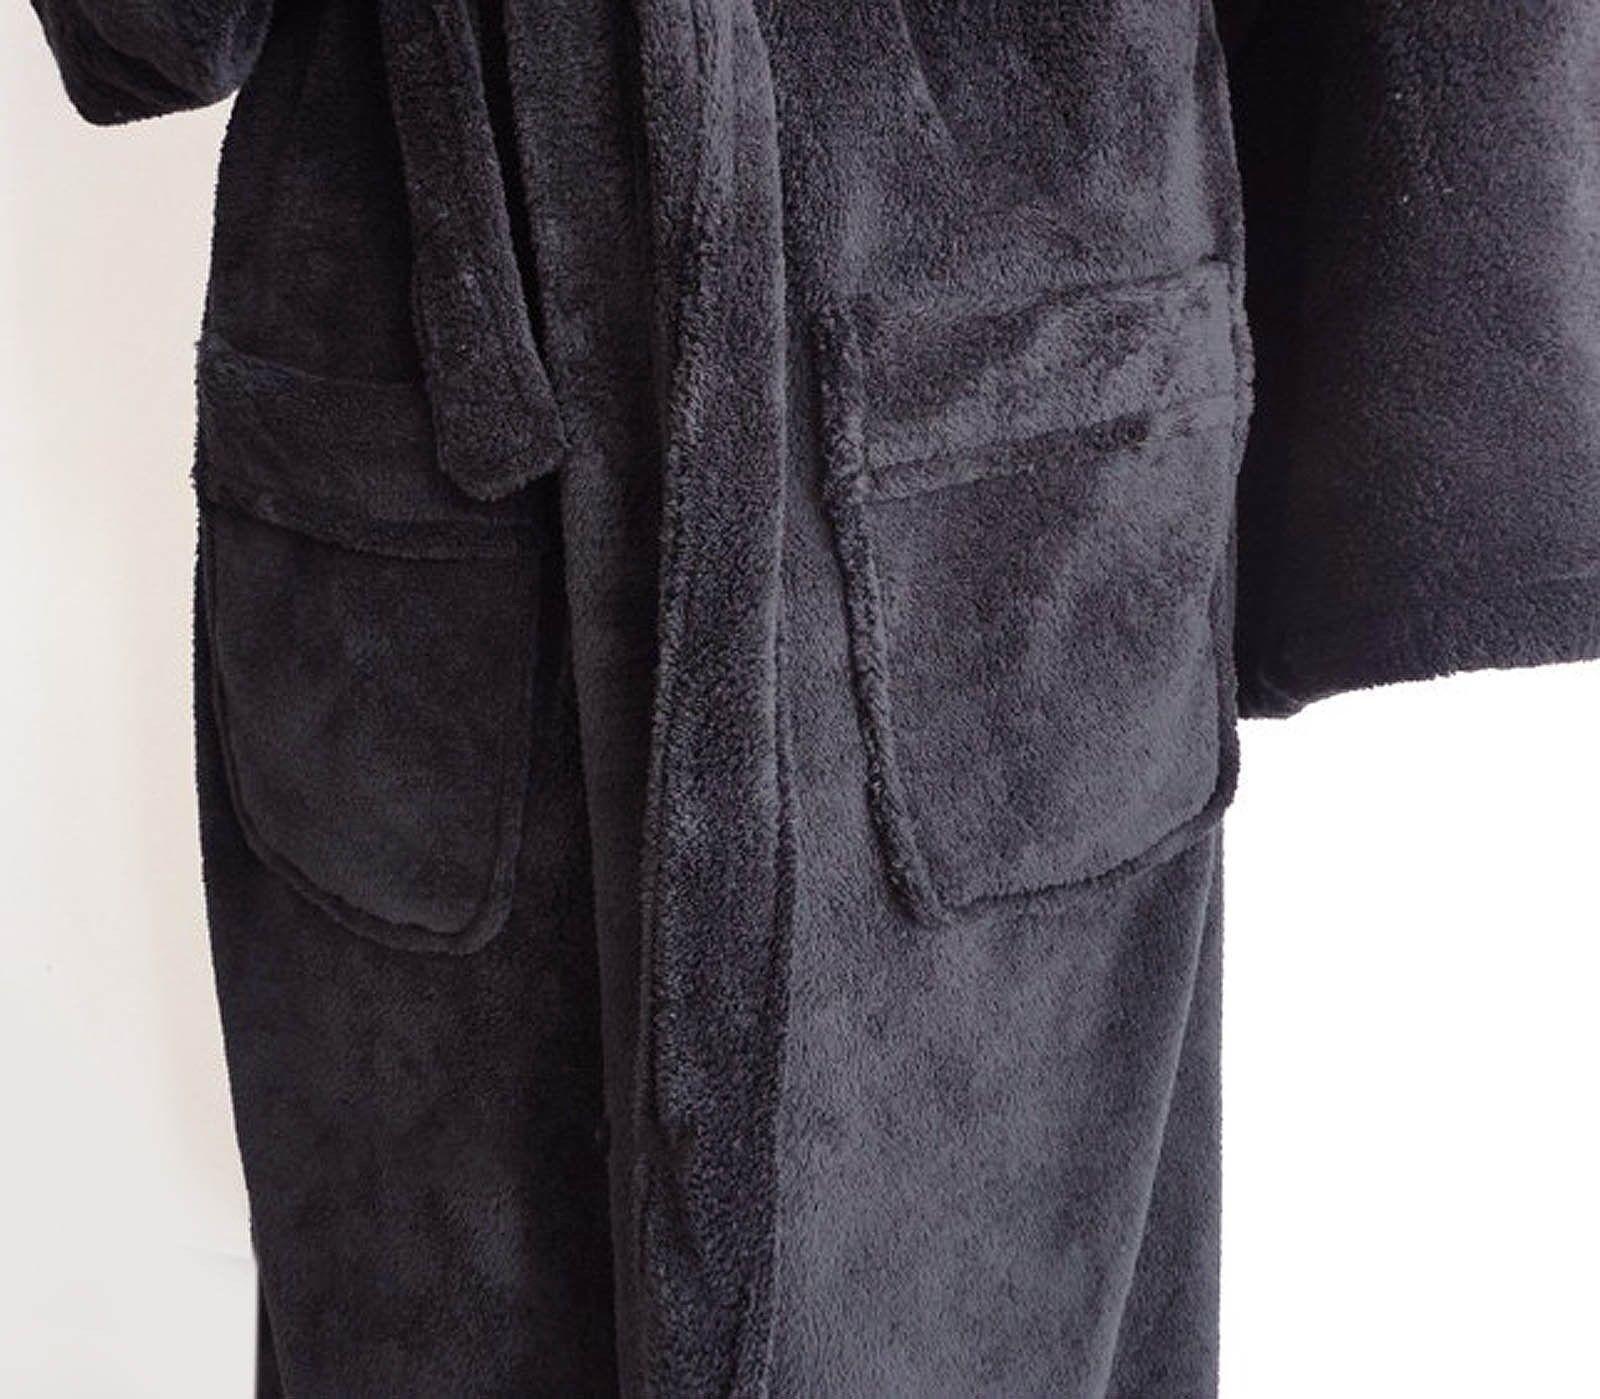 779f4f5cd5 Mens Hooded Bathrobe Turkish Cotton Terry Spa Robe With Hood Men Star War  bath 7 7 of 10 ...